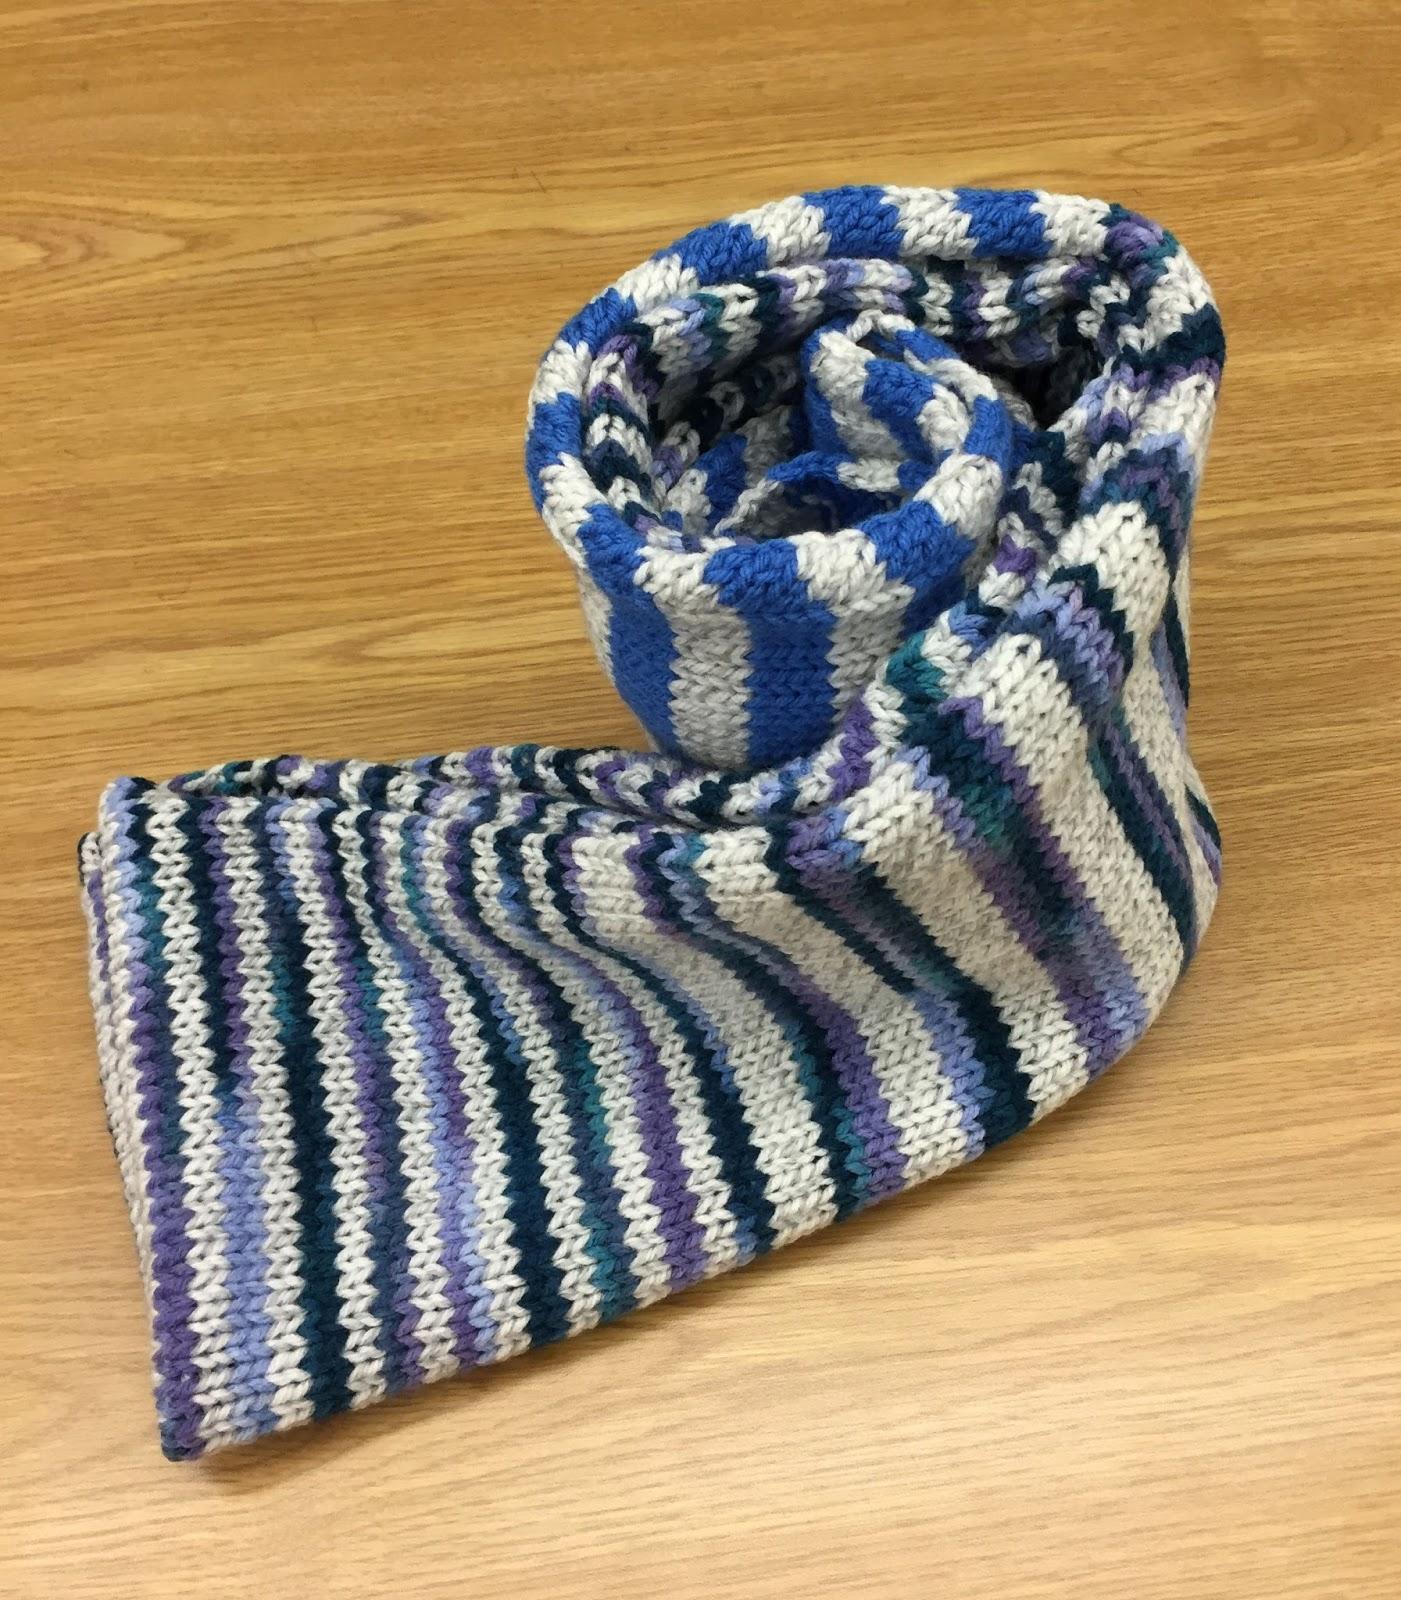 Striped Infinity Scarf Knitting Pattern : Shannon Maria Knits: Multi-Striped Infinity Scarf